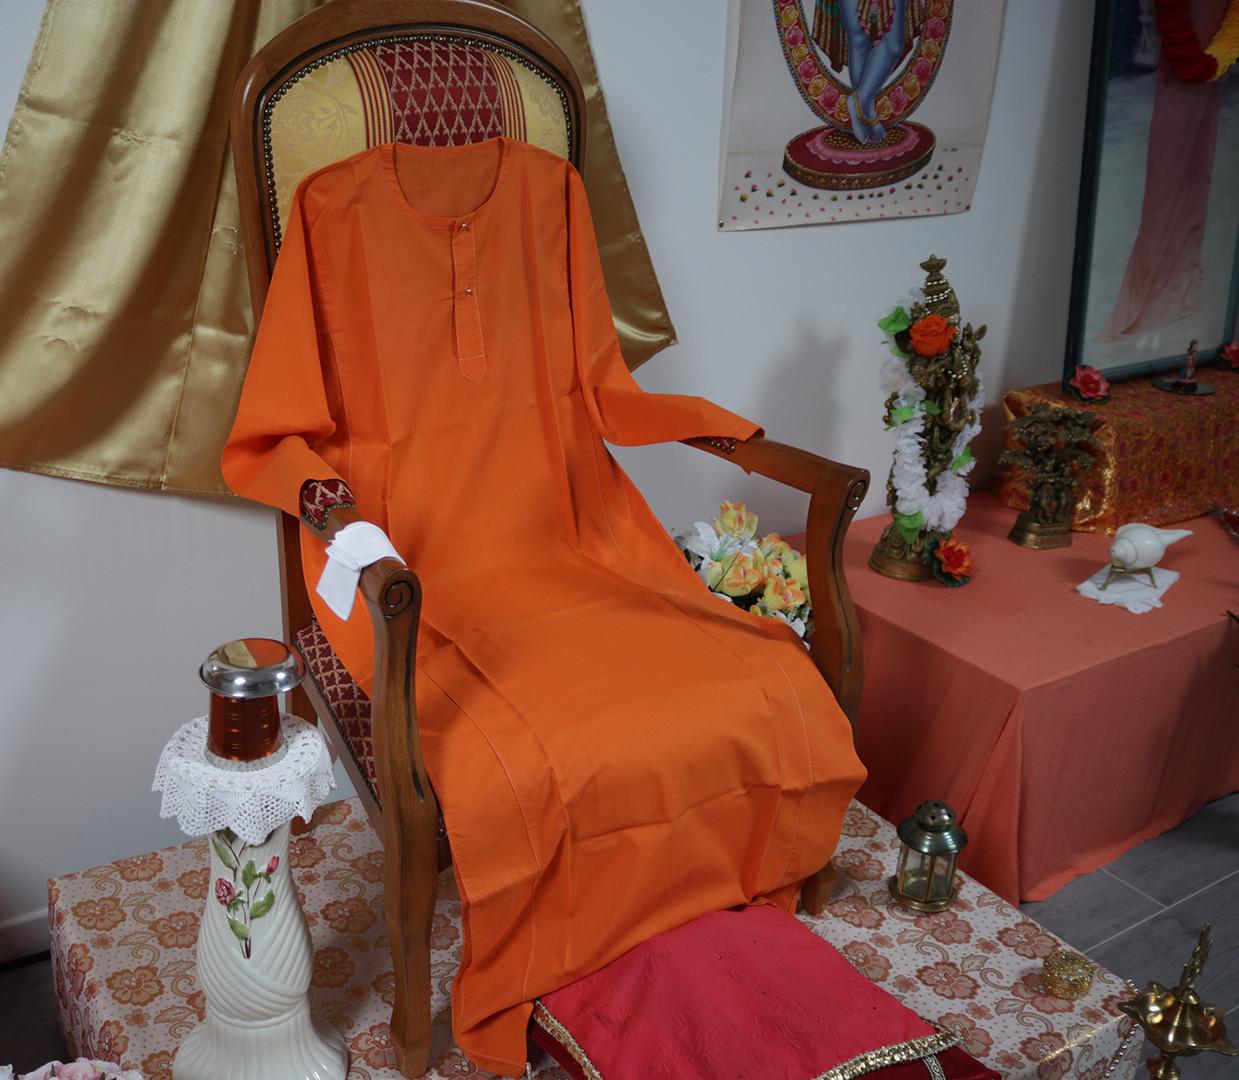 Robe de Bhagavan Shri Sathya Sai Baba